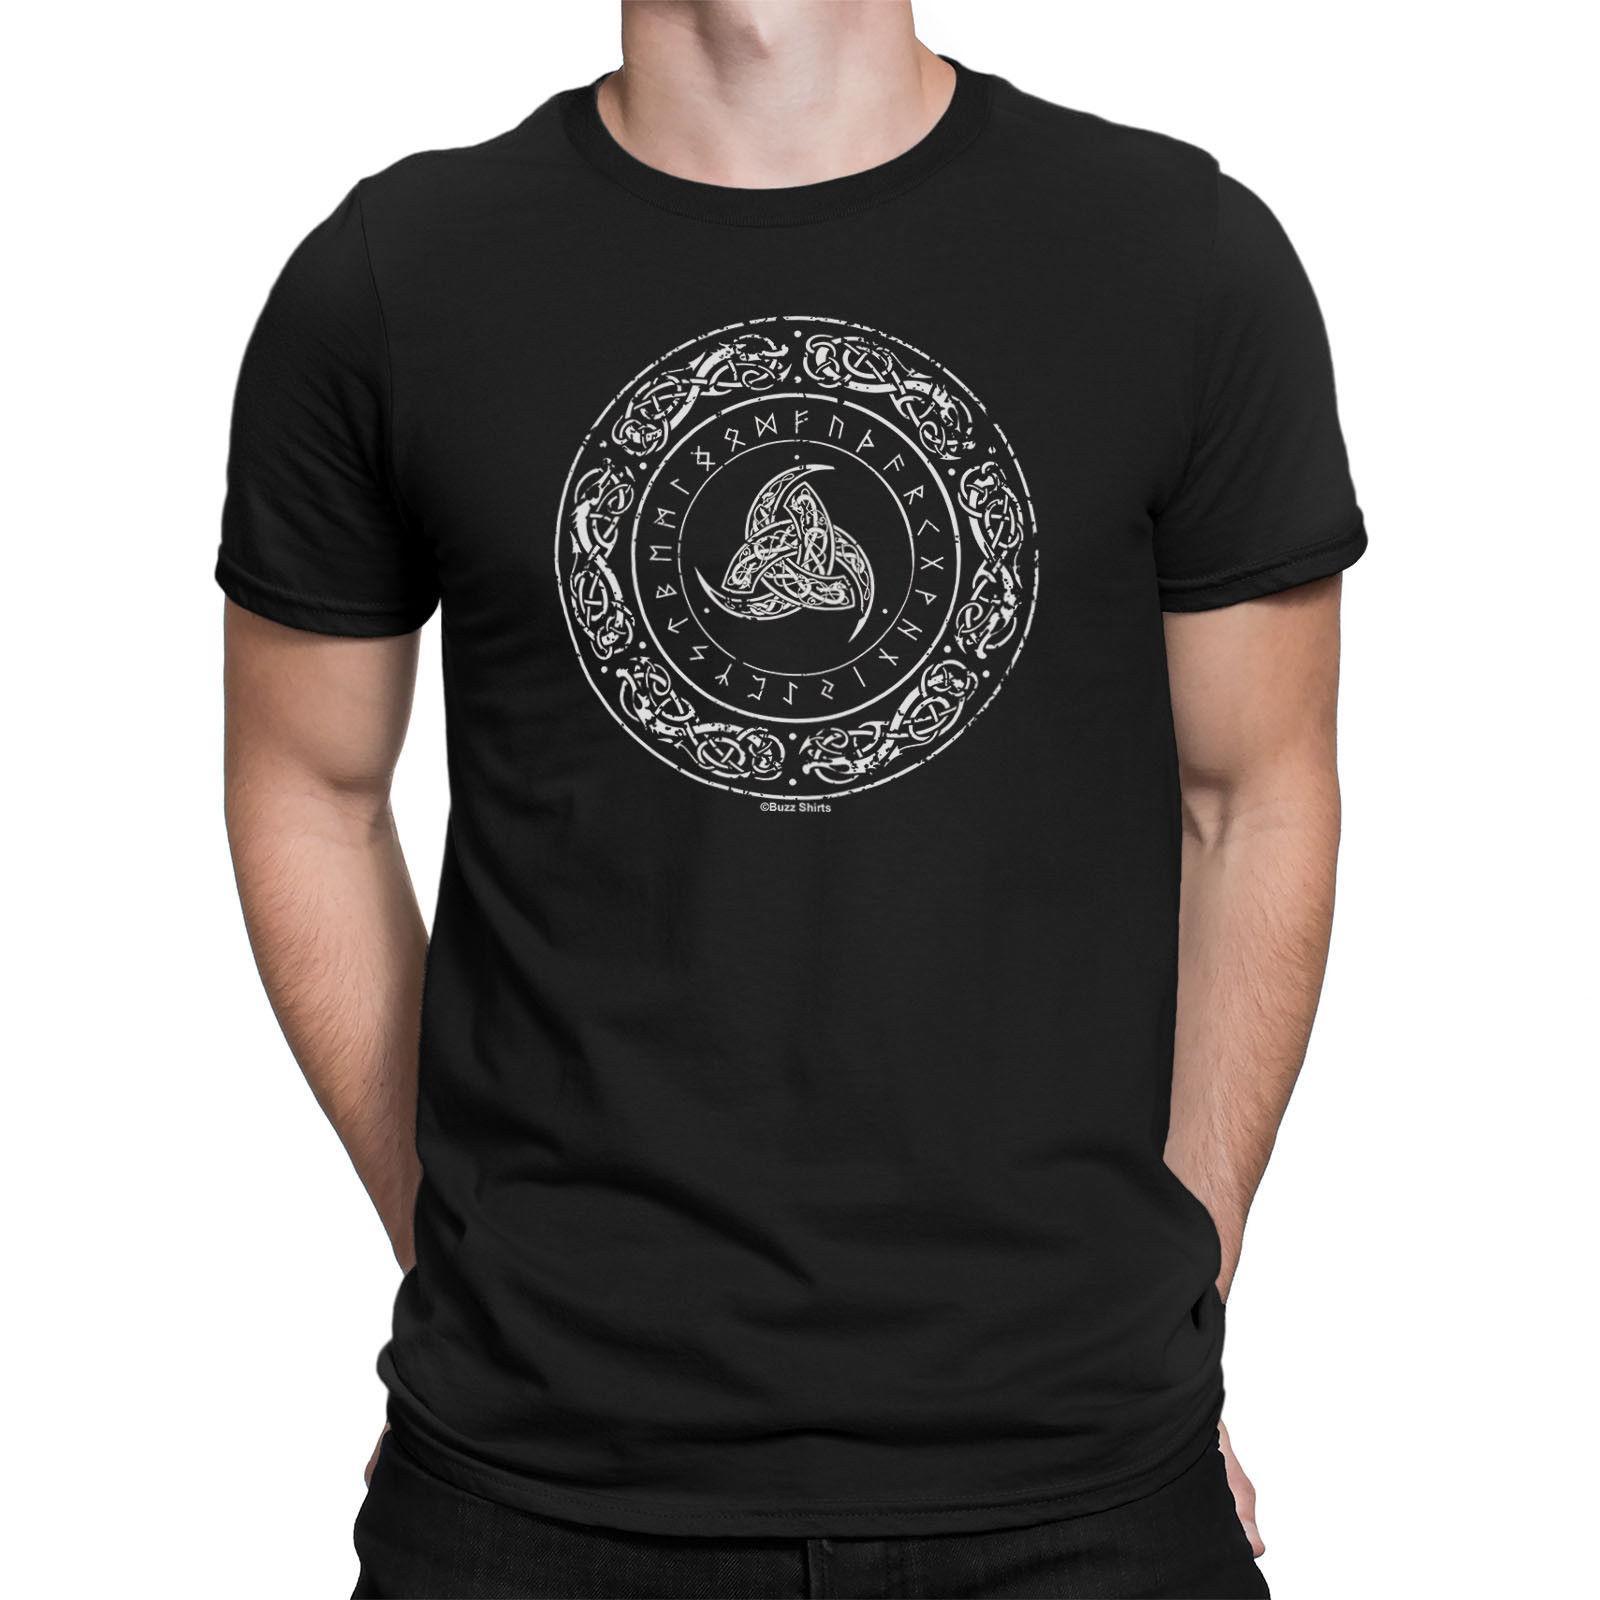 55252da5a ODINS HORN SYMBOL Mens Viking T Shirt Vikings Thor Ragnar Nordic Mythology  Top Funny Unisex Casual Tshirt Top Men Shirts T Shirt Online From  Tshirtdoctor